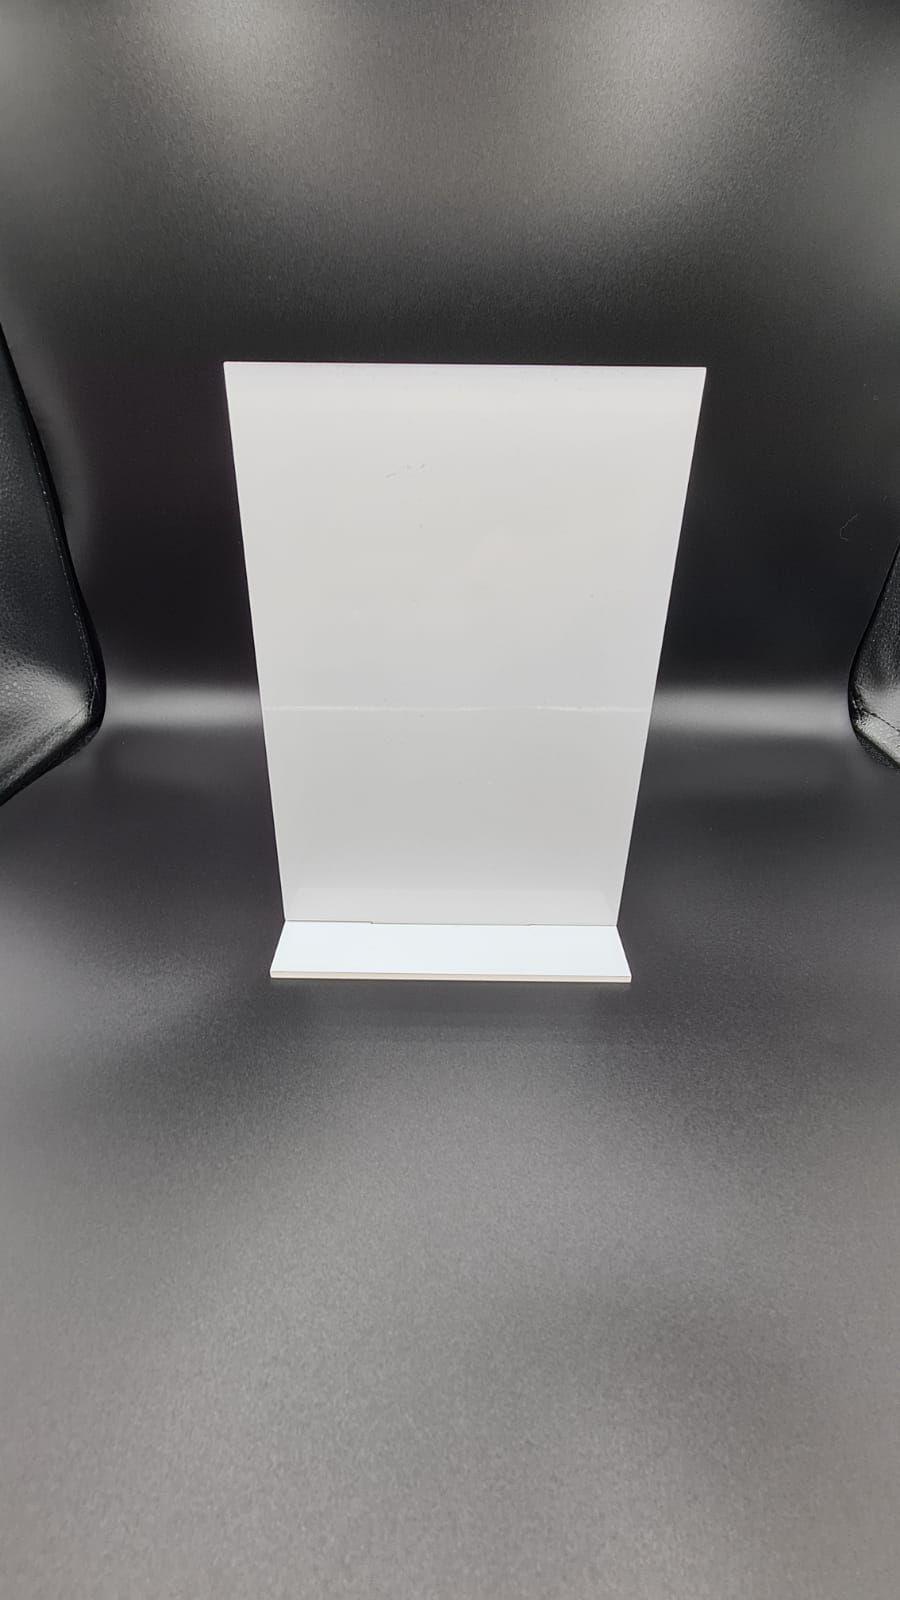 Freestanding Acrylic Rectangle - A4 (Portrait)